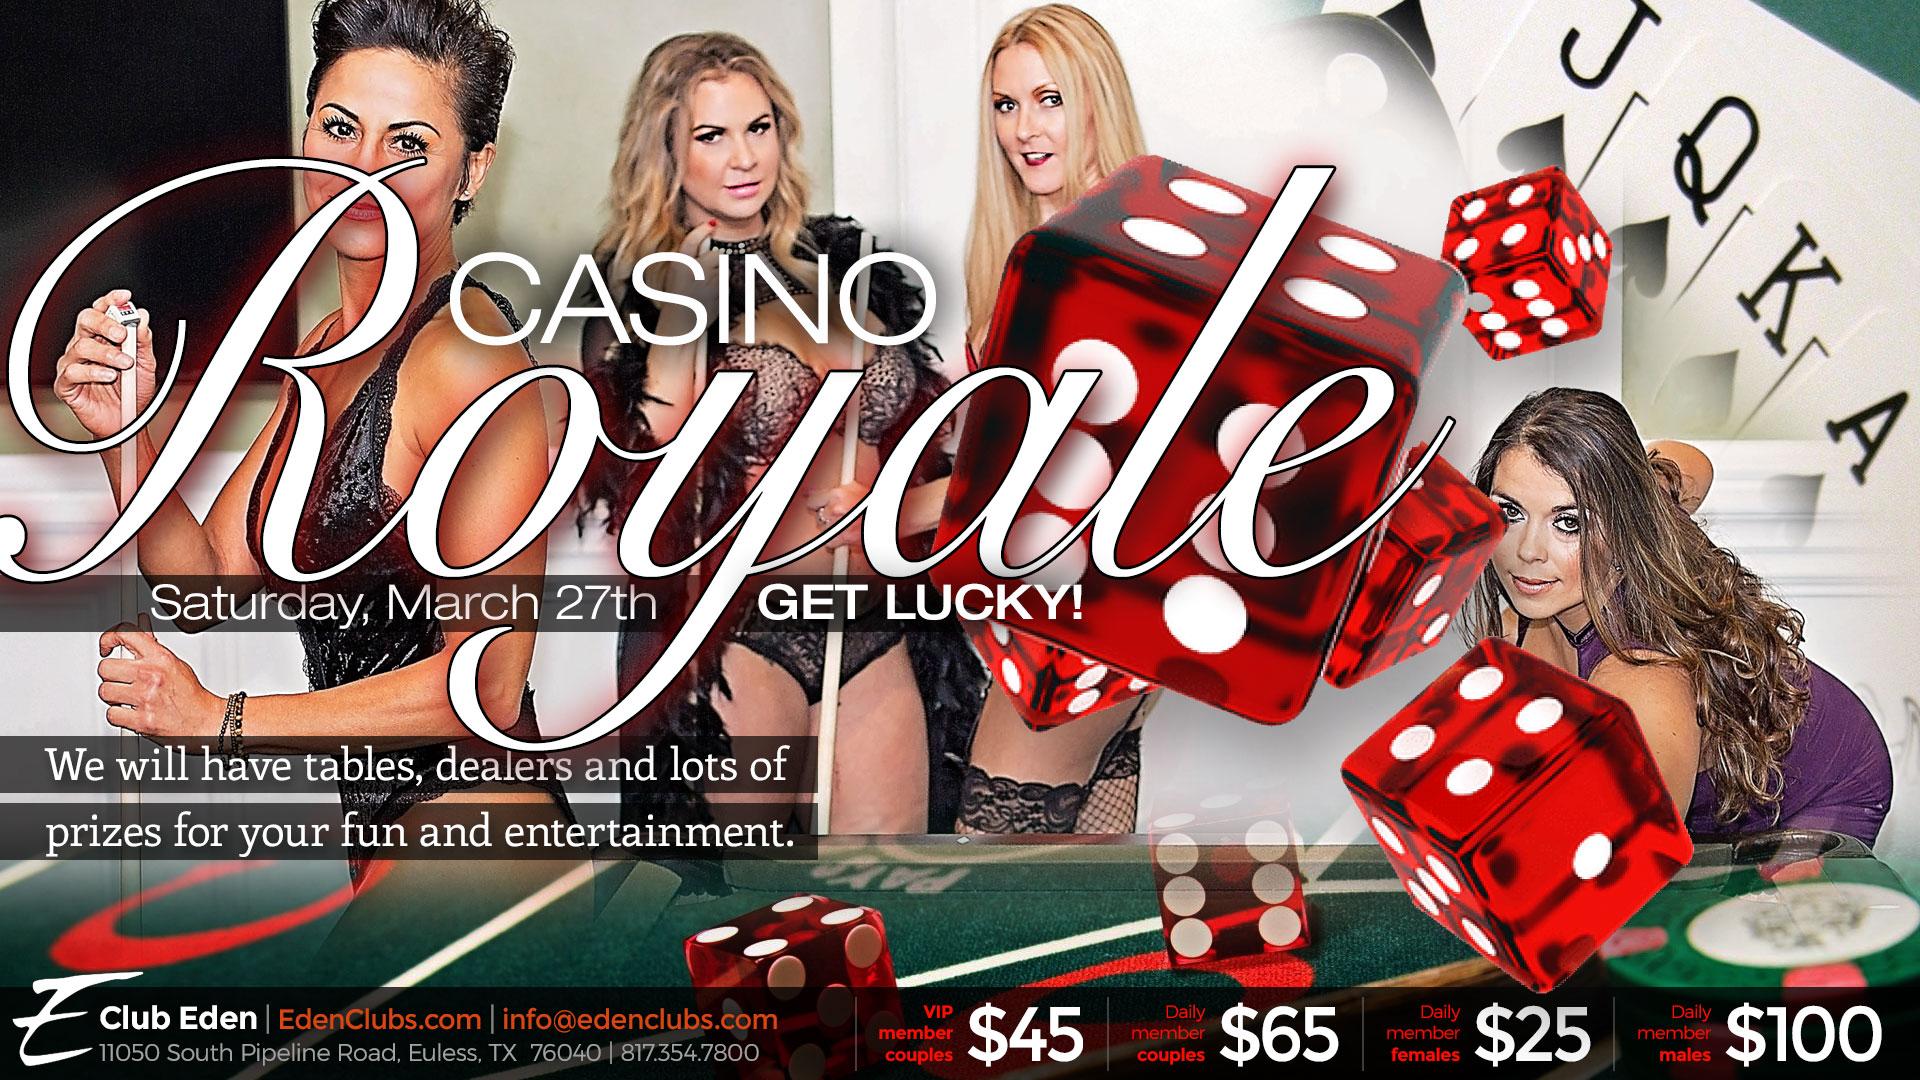 032721-casino-royale-tv